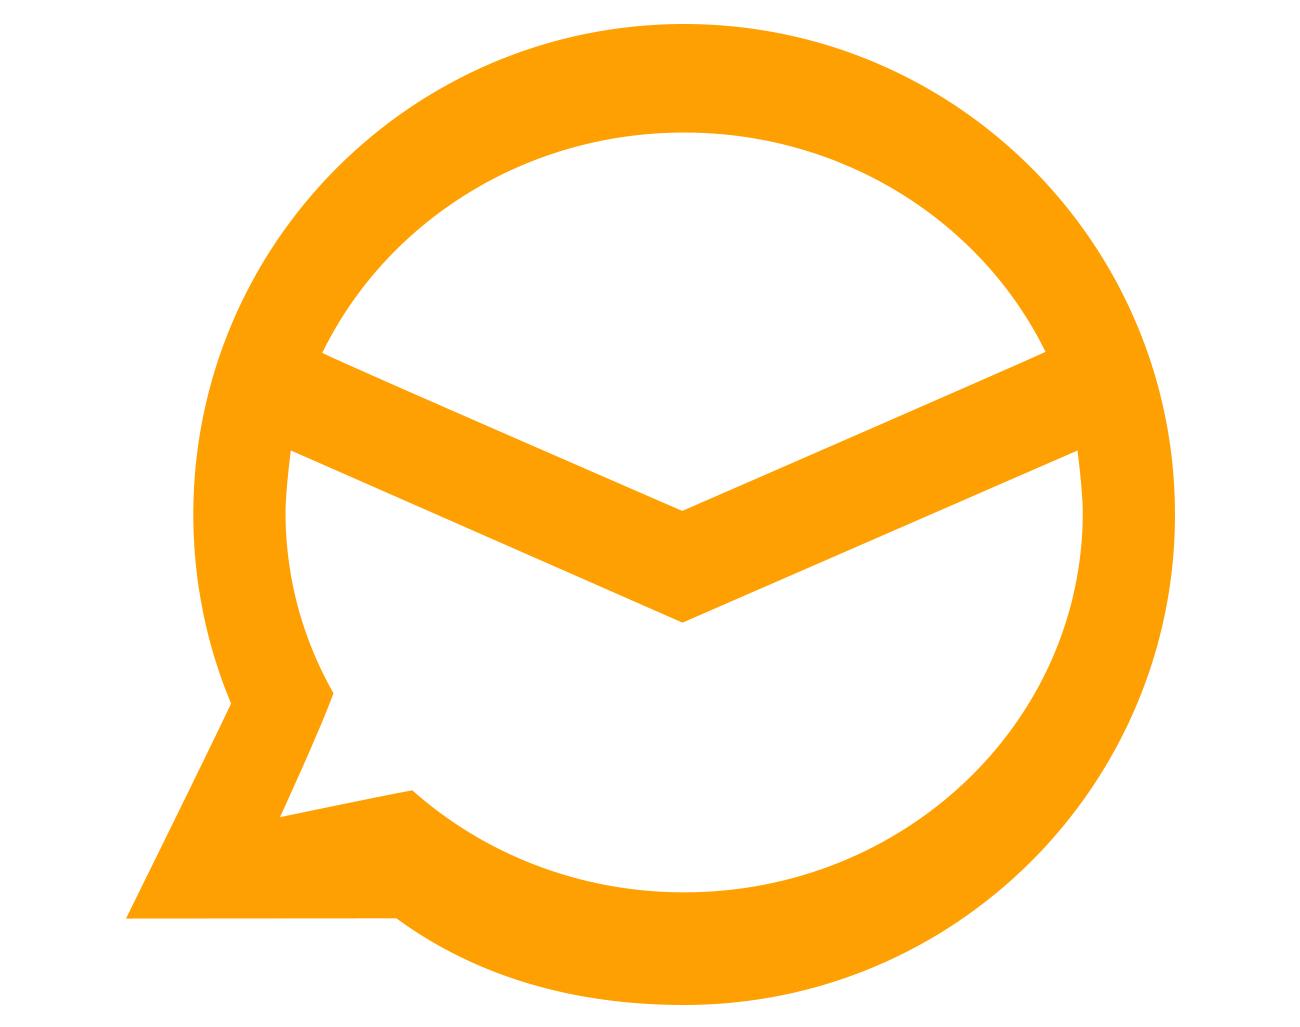 eM Client (WIN) Special Deal für Pro Version immer noch aktiv